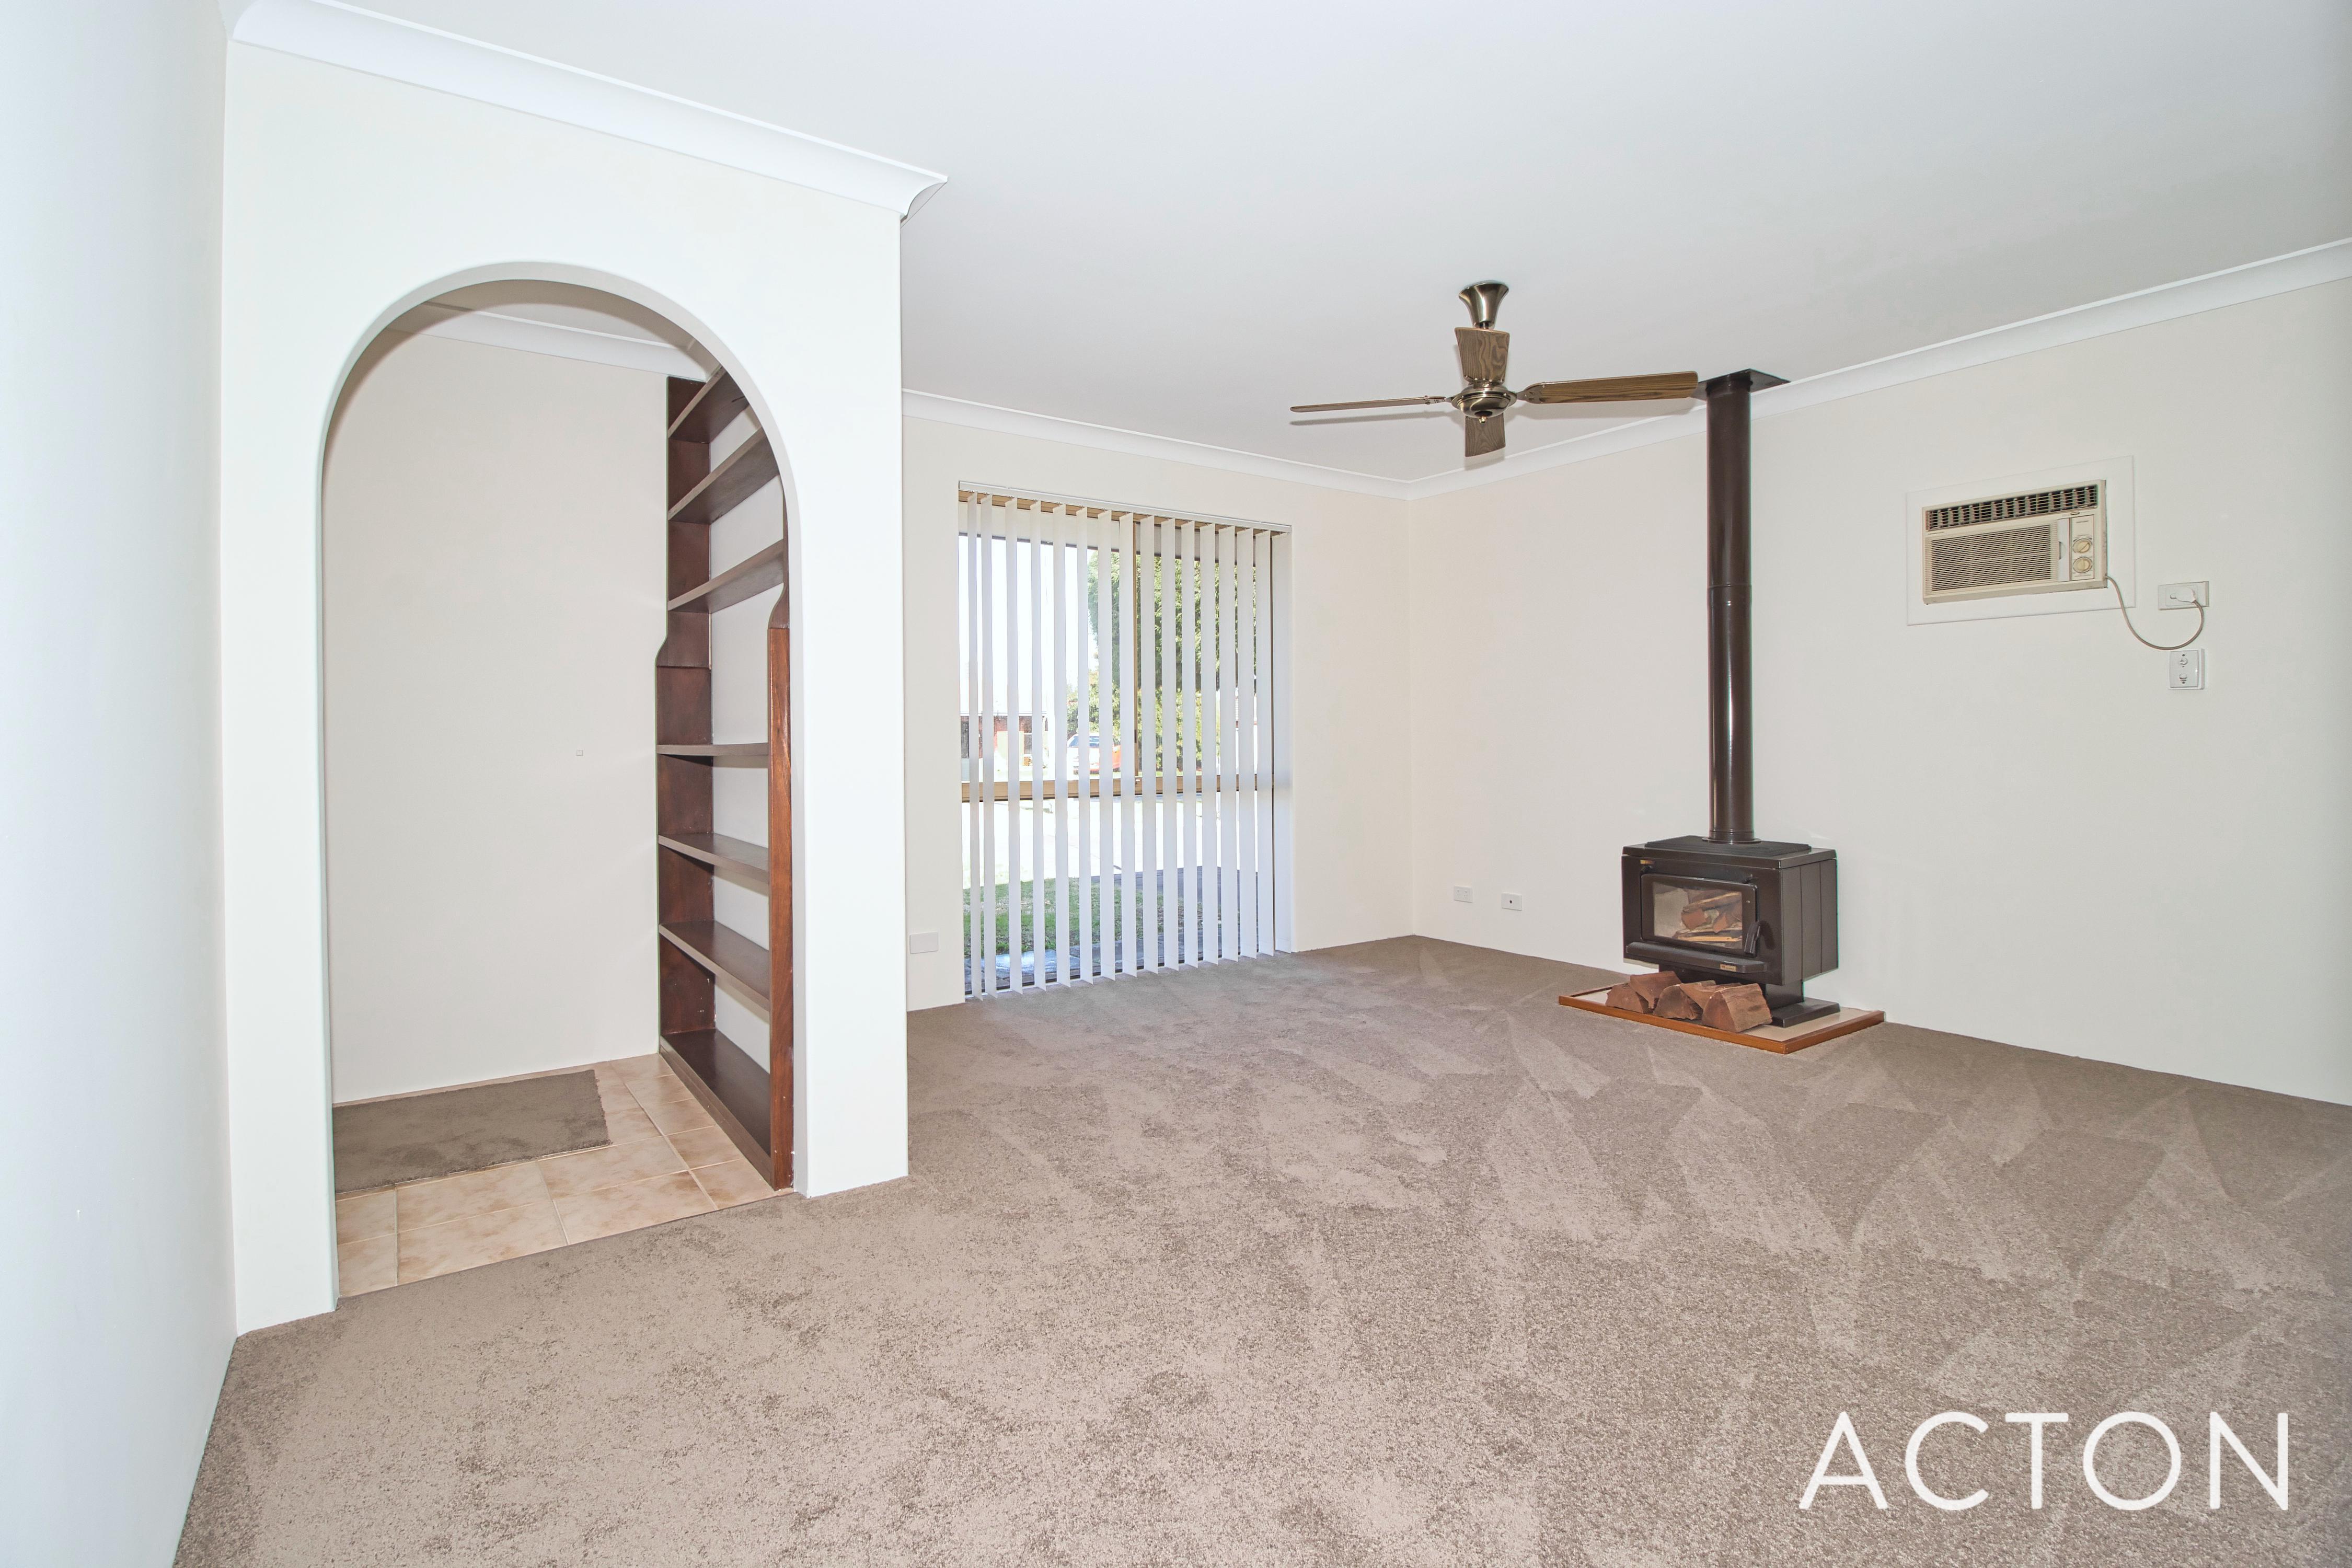 15 Kingsbridge Road Warnbro - House For Sale - 23231585 - ACTON Rockingham